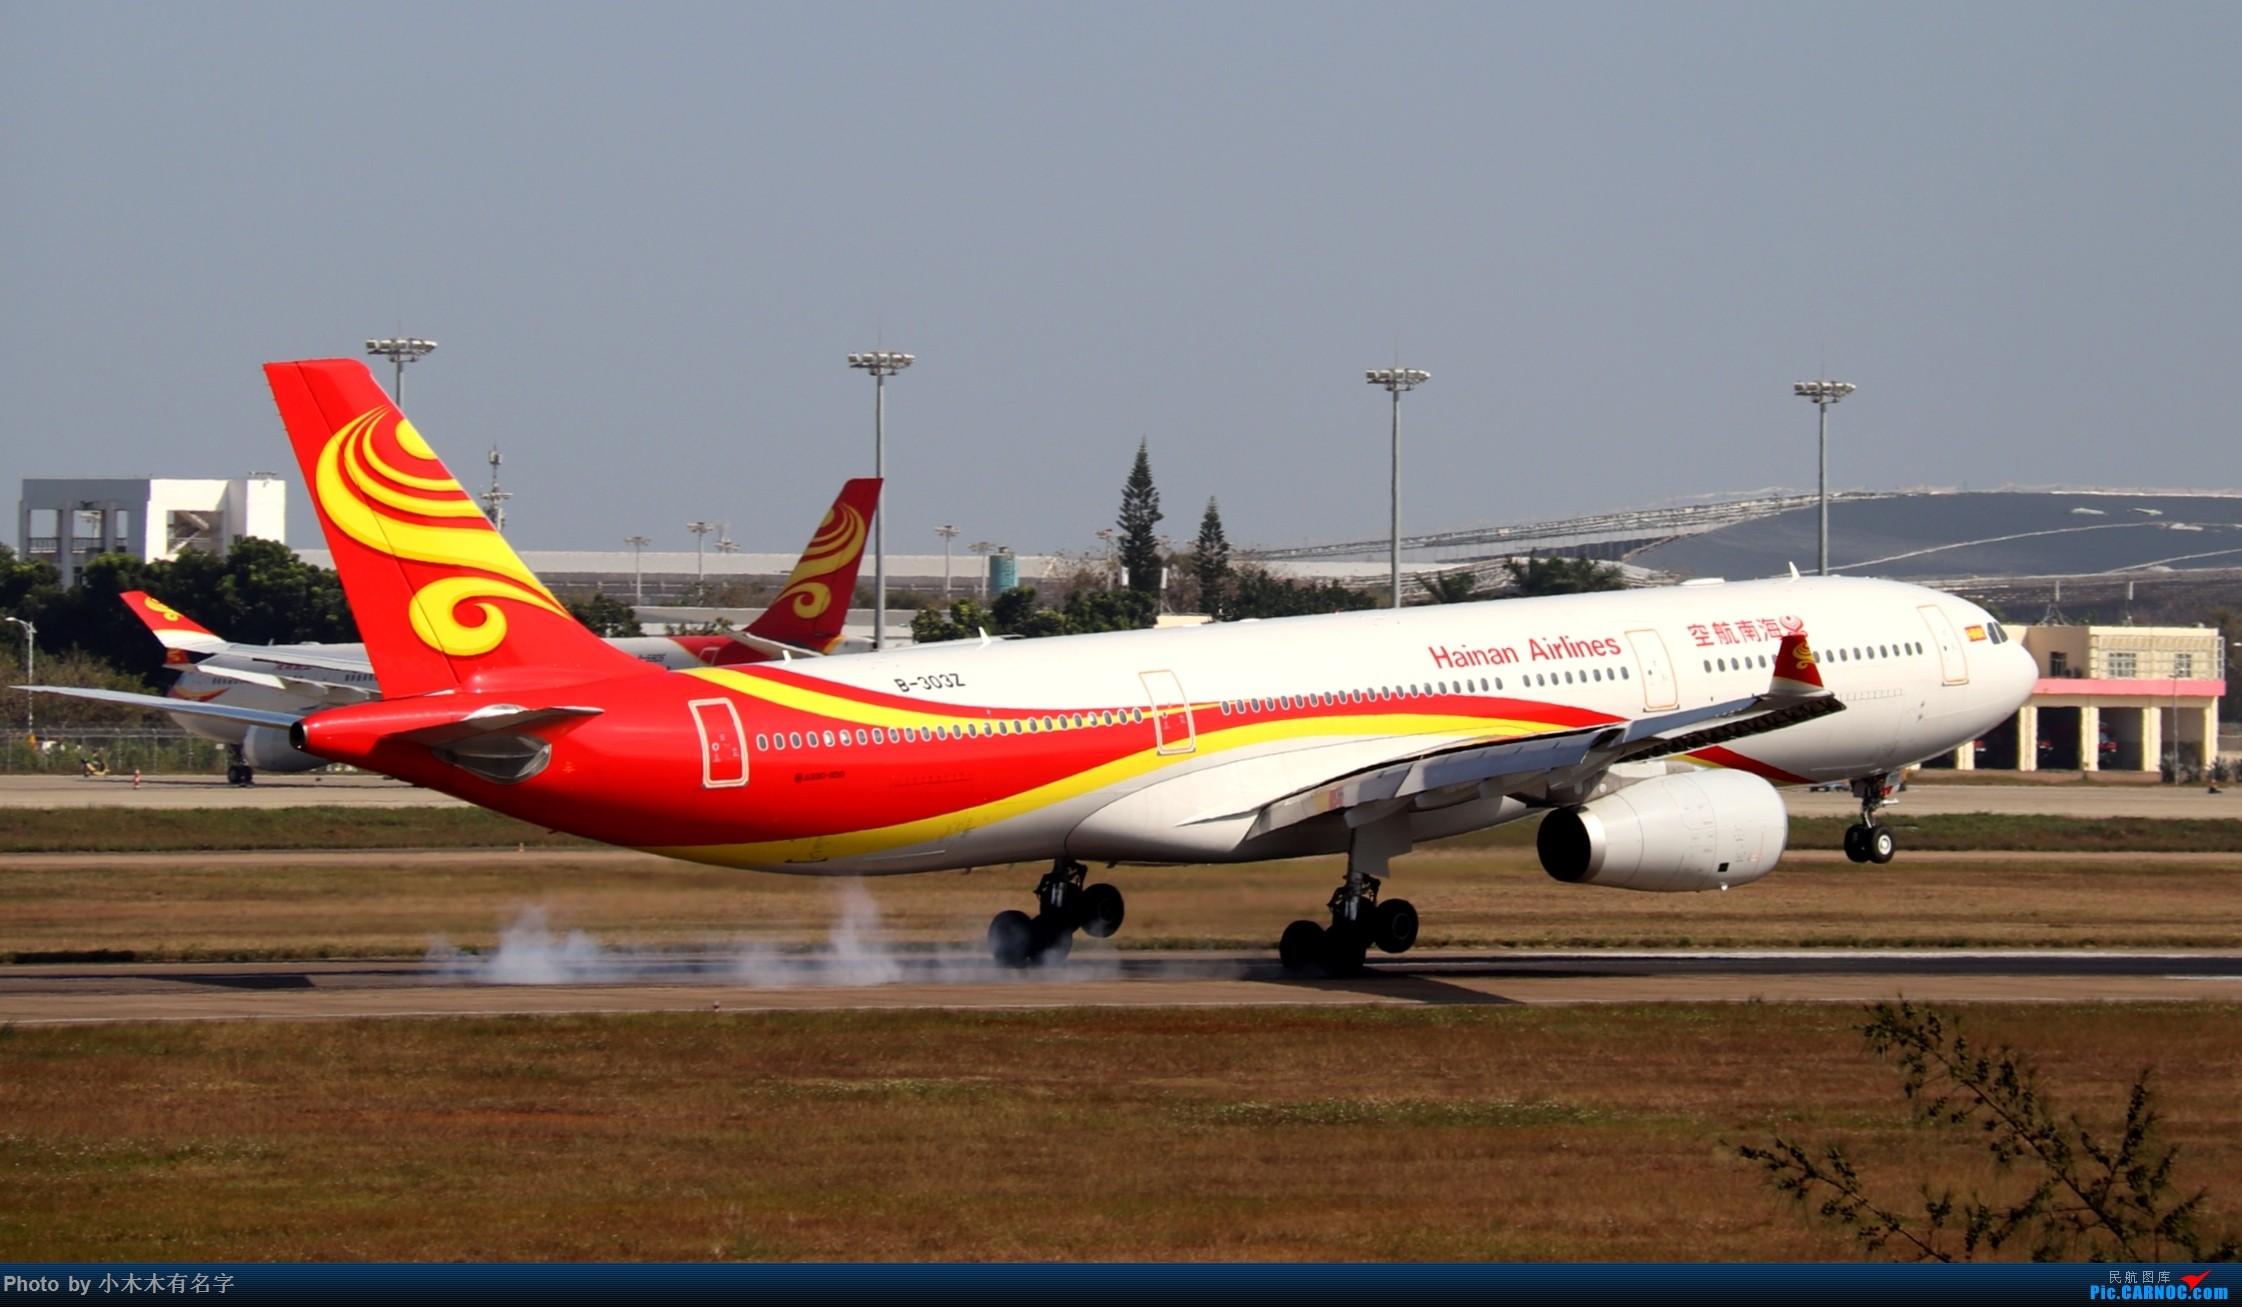 Re:[原创]2019冬天的海口美兰 AIRBUS A330-300 B-303Z 中国海口美兰国际机场